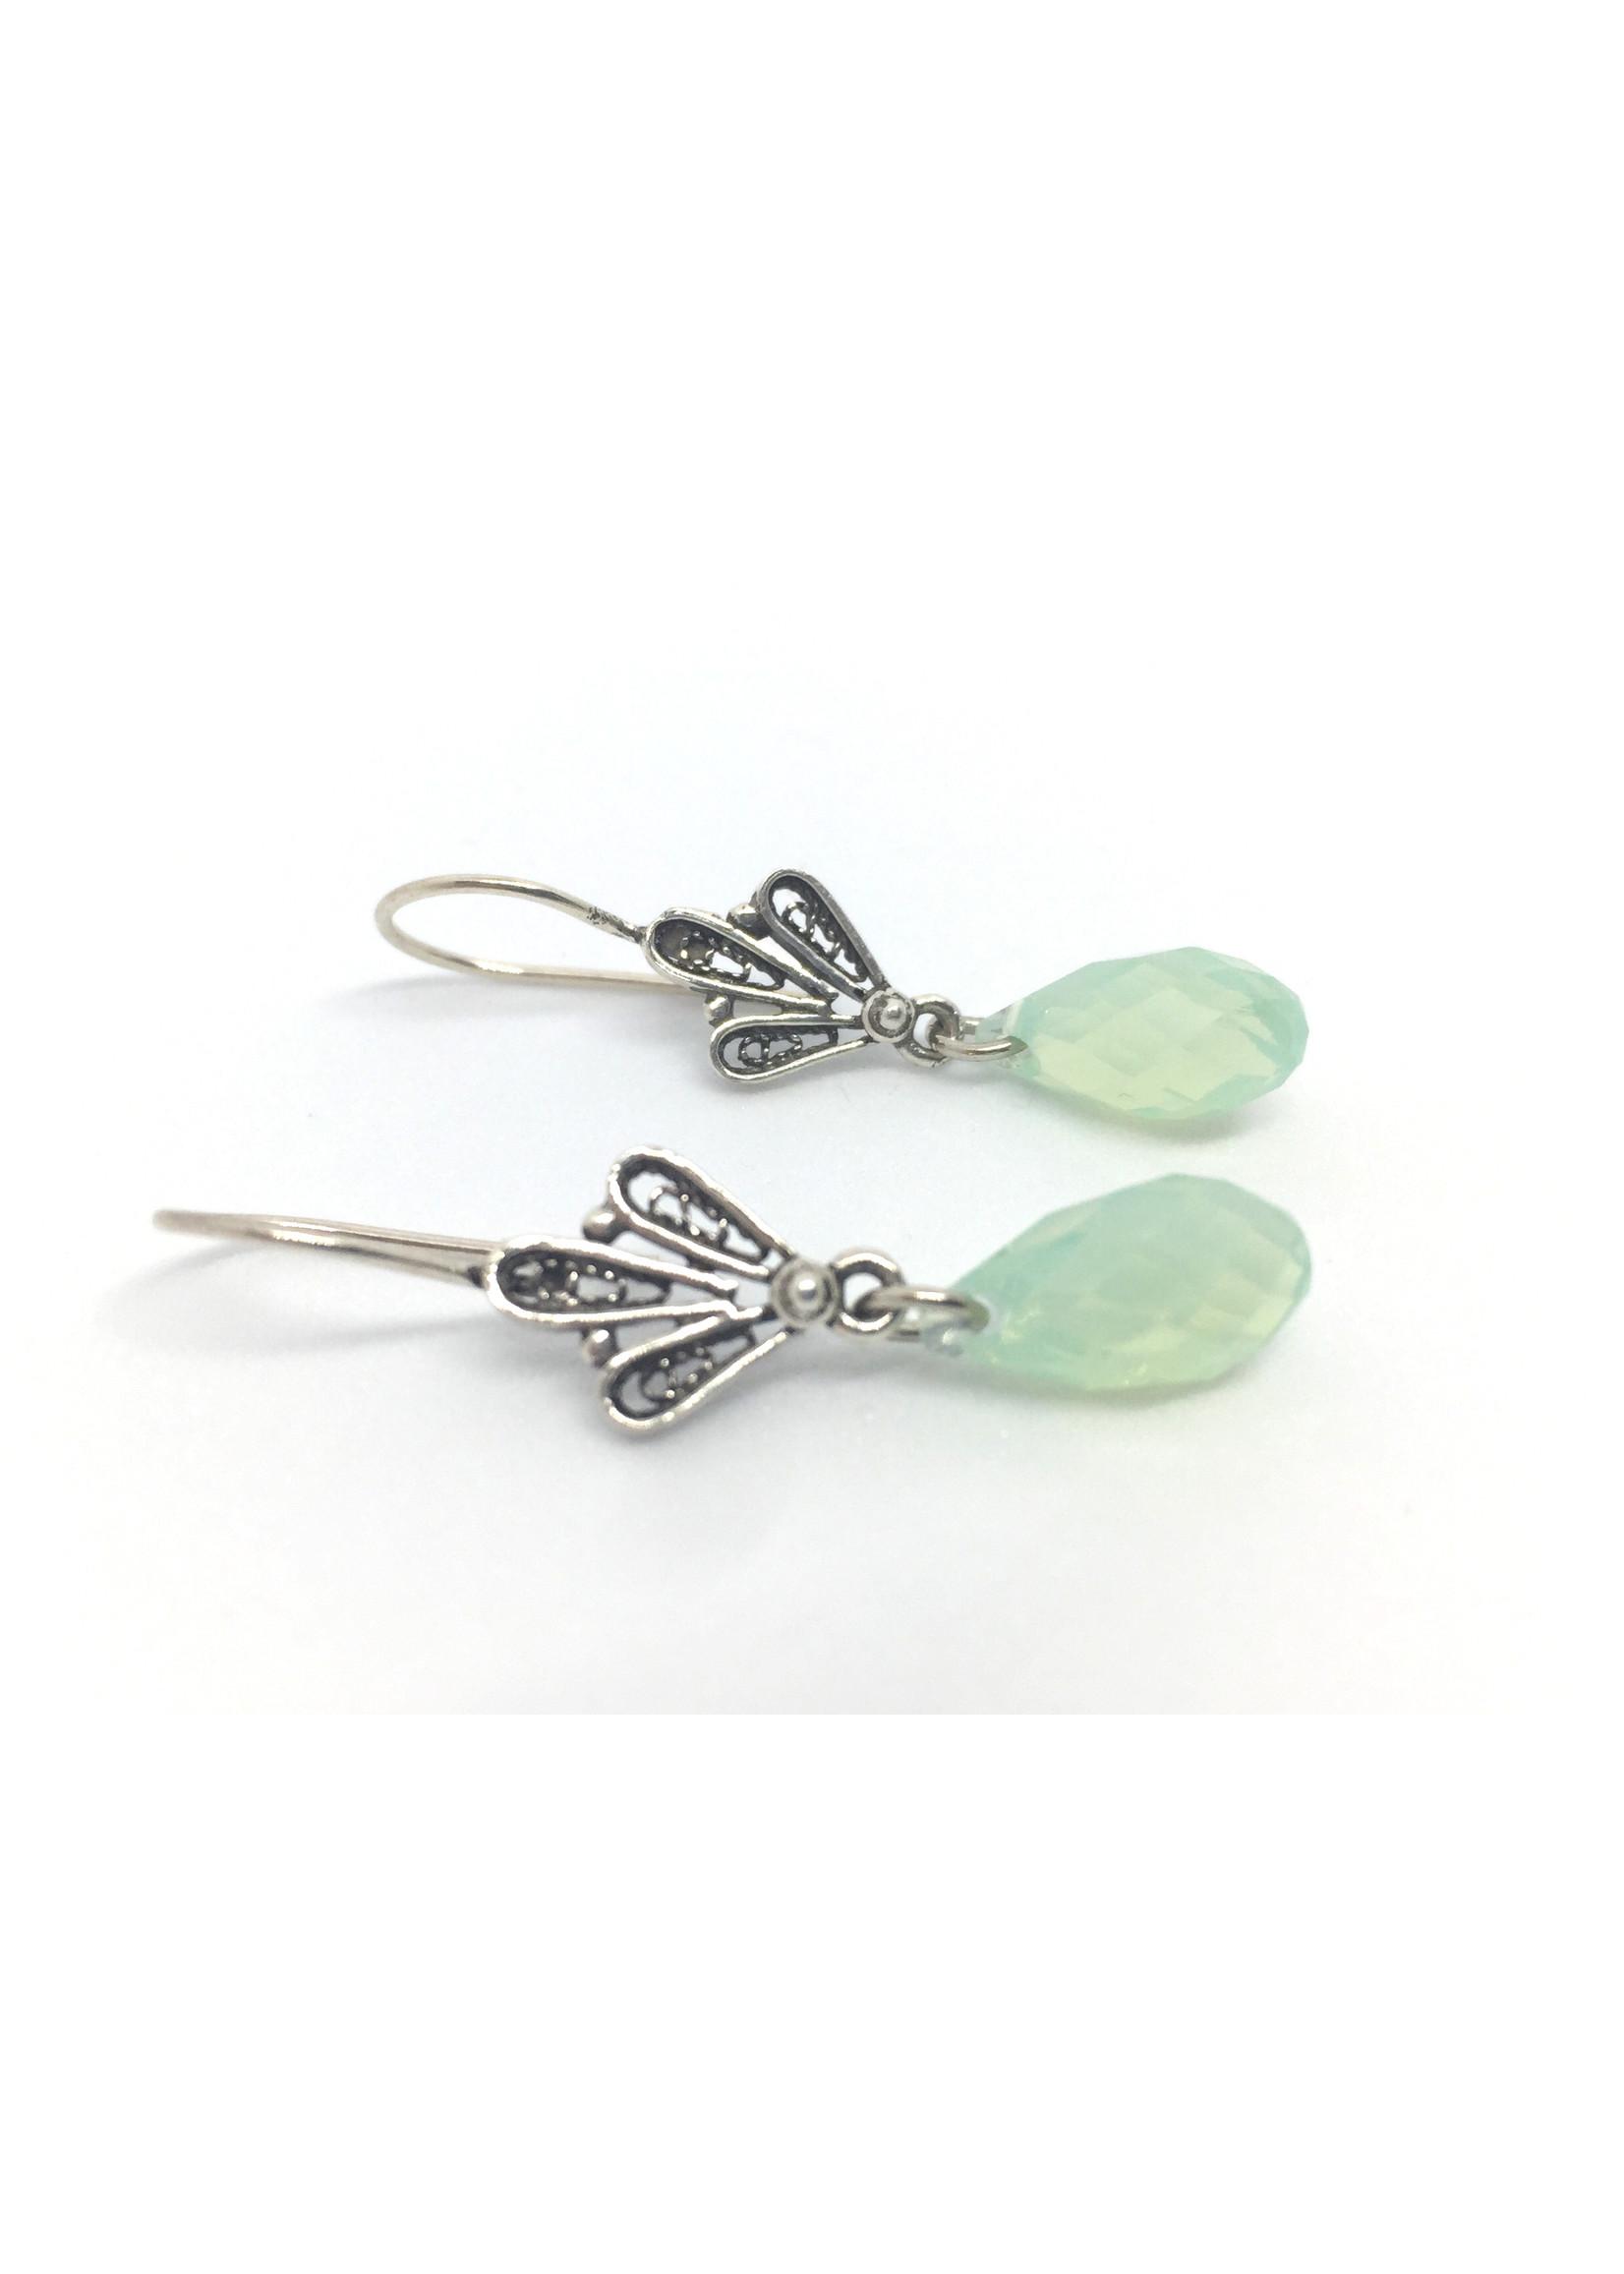 Silver earrings from Els de Ruyter with Svarovski crystal